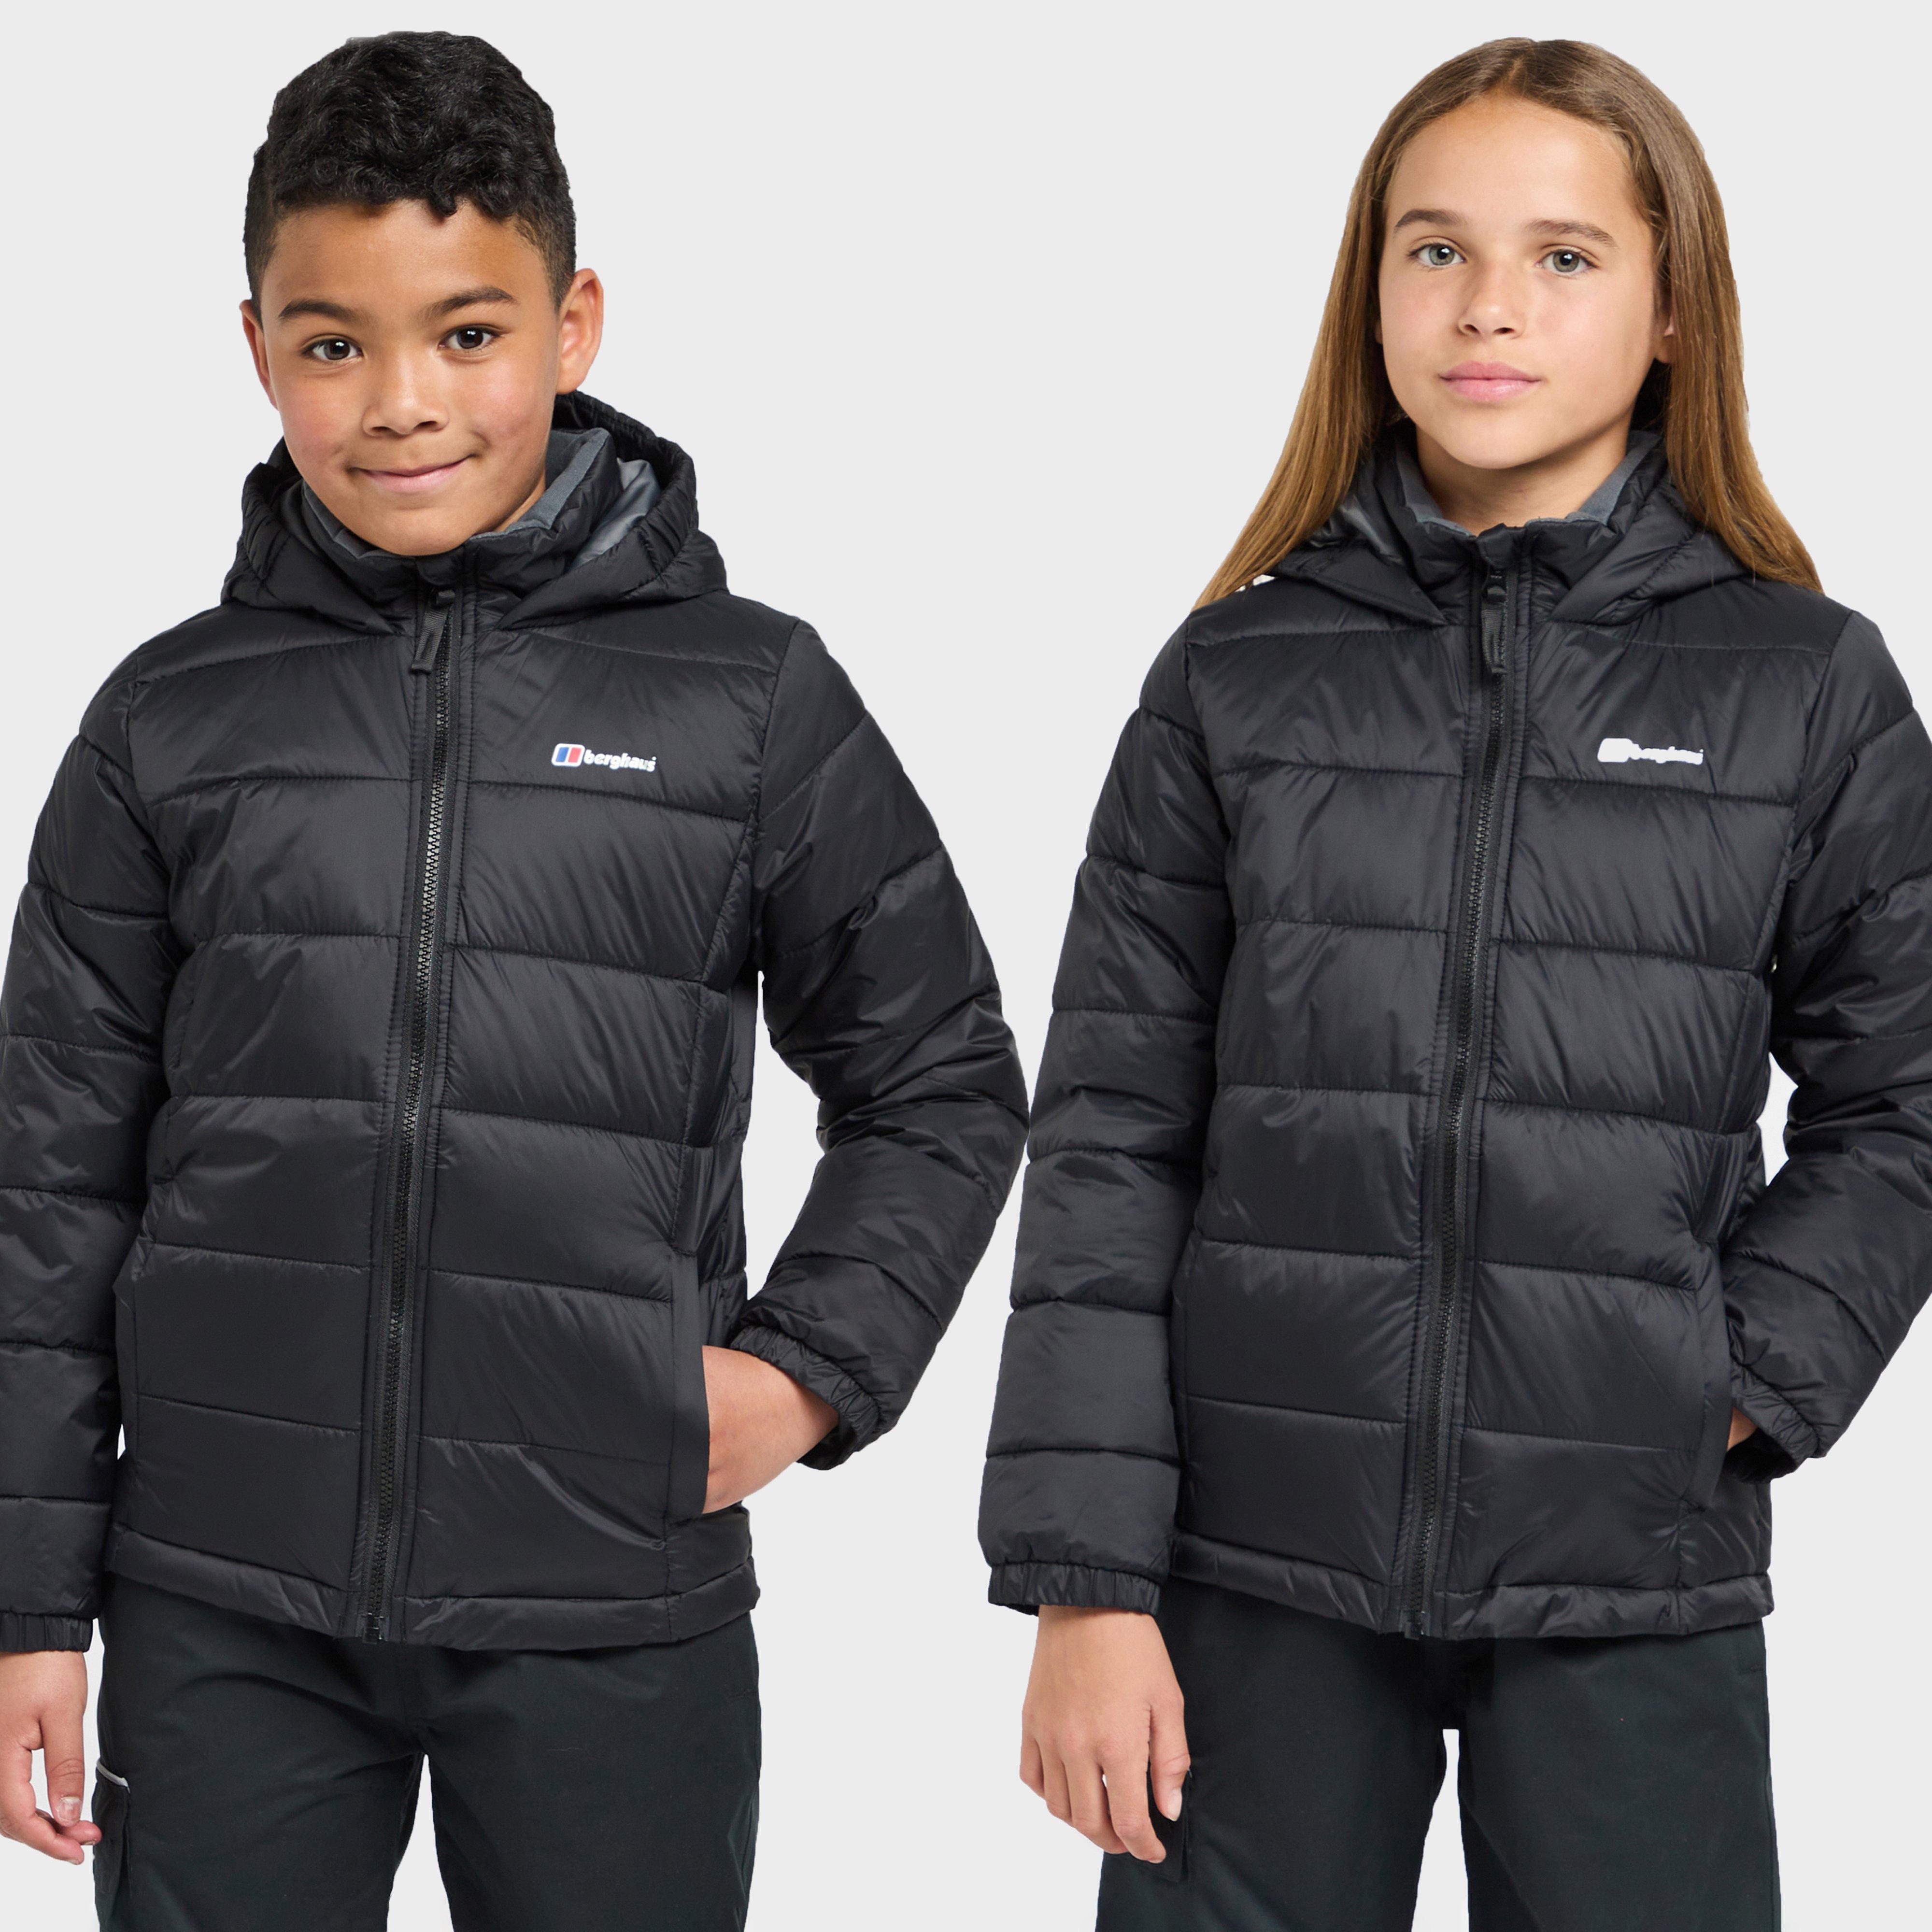 Berghaus Kids Burham Insulated Jacket - Black  Black